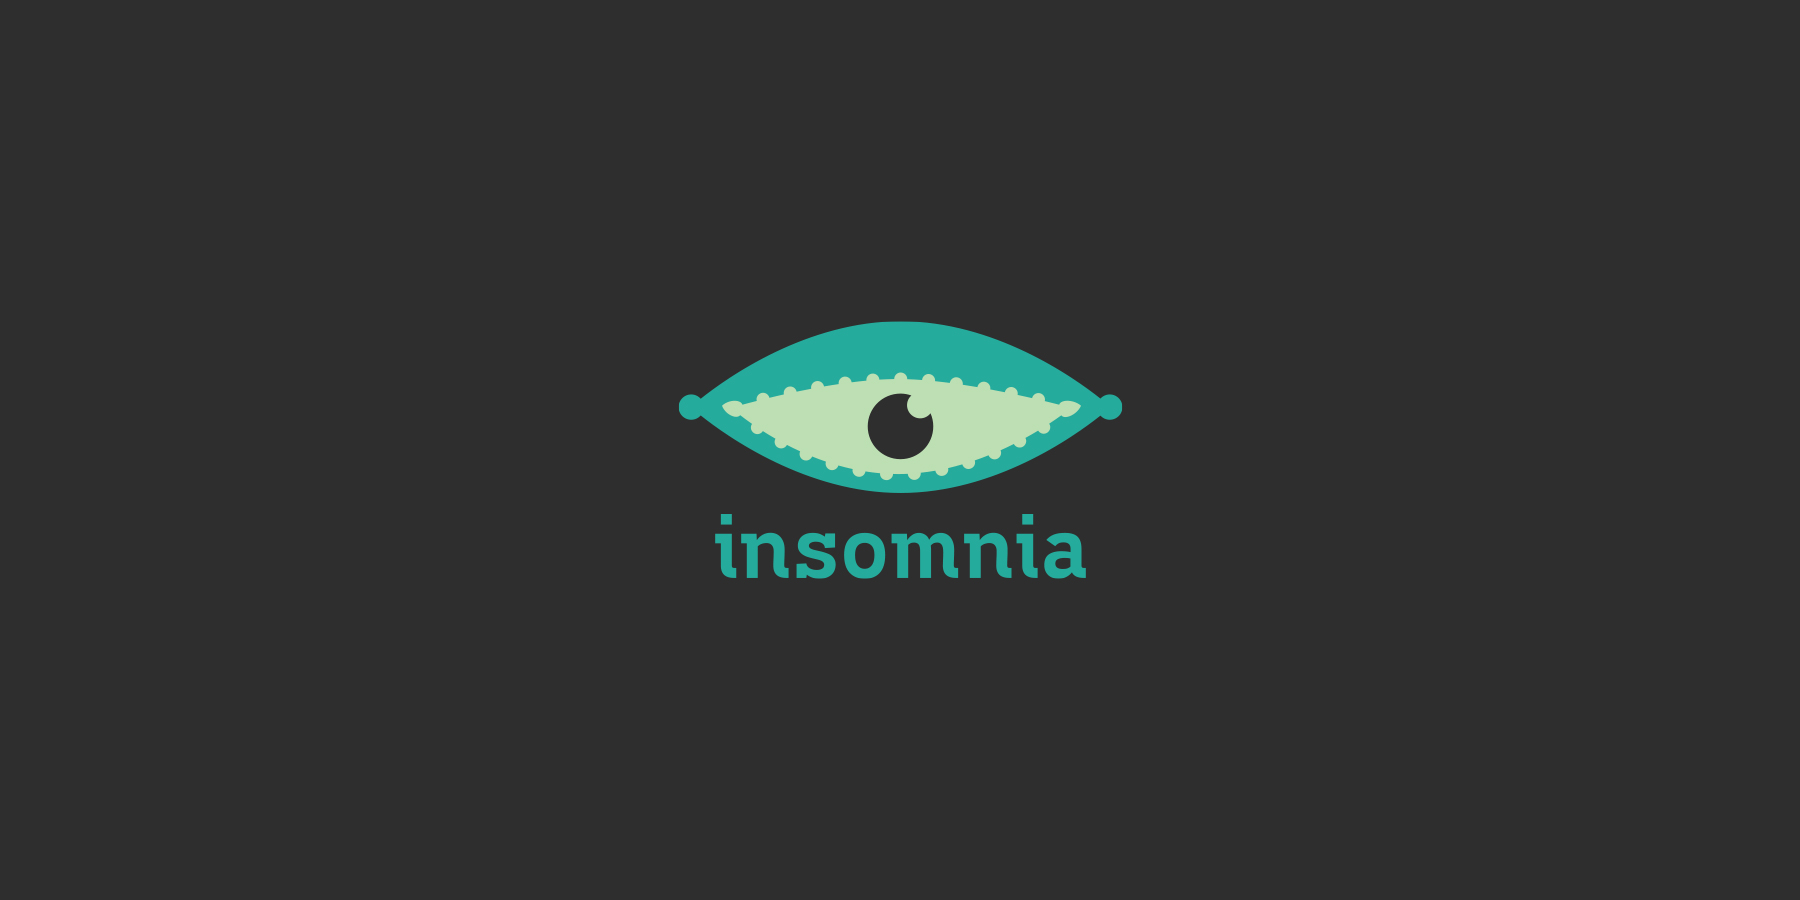 insomnia-logo-design-03